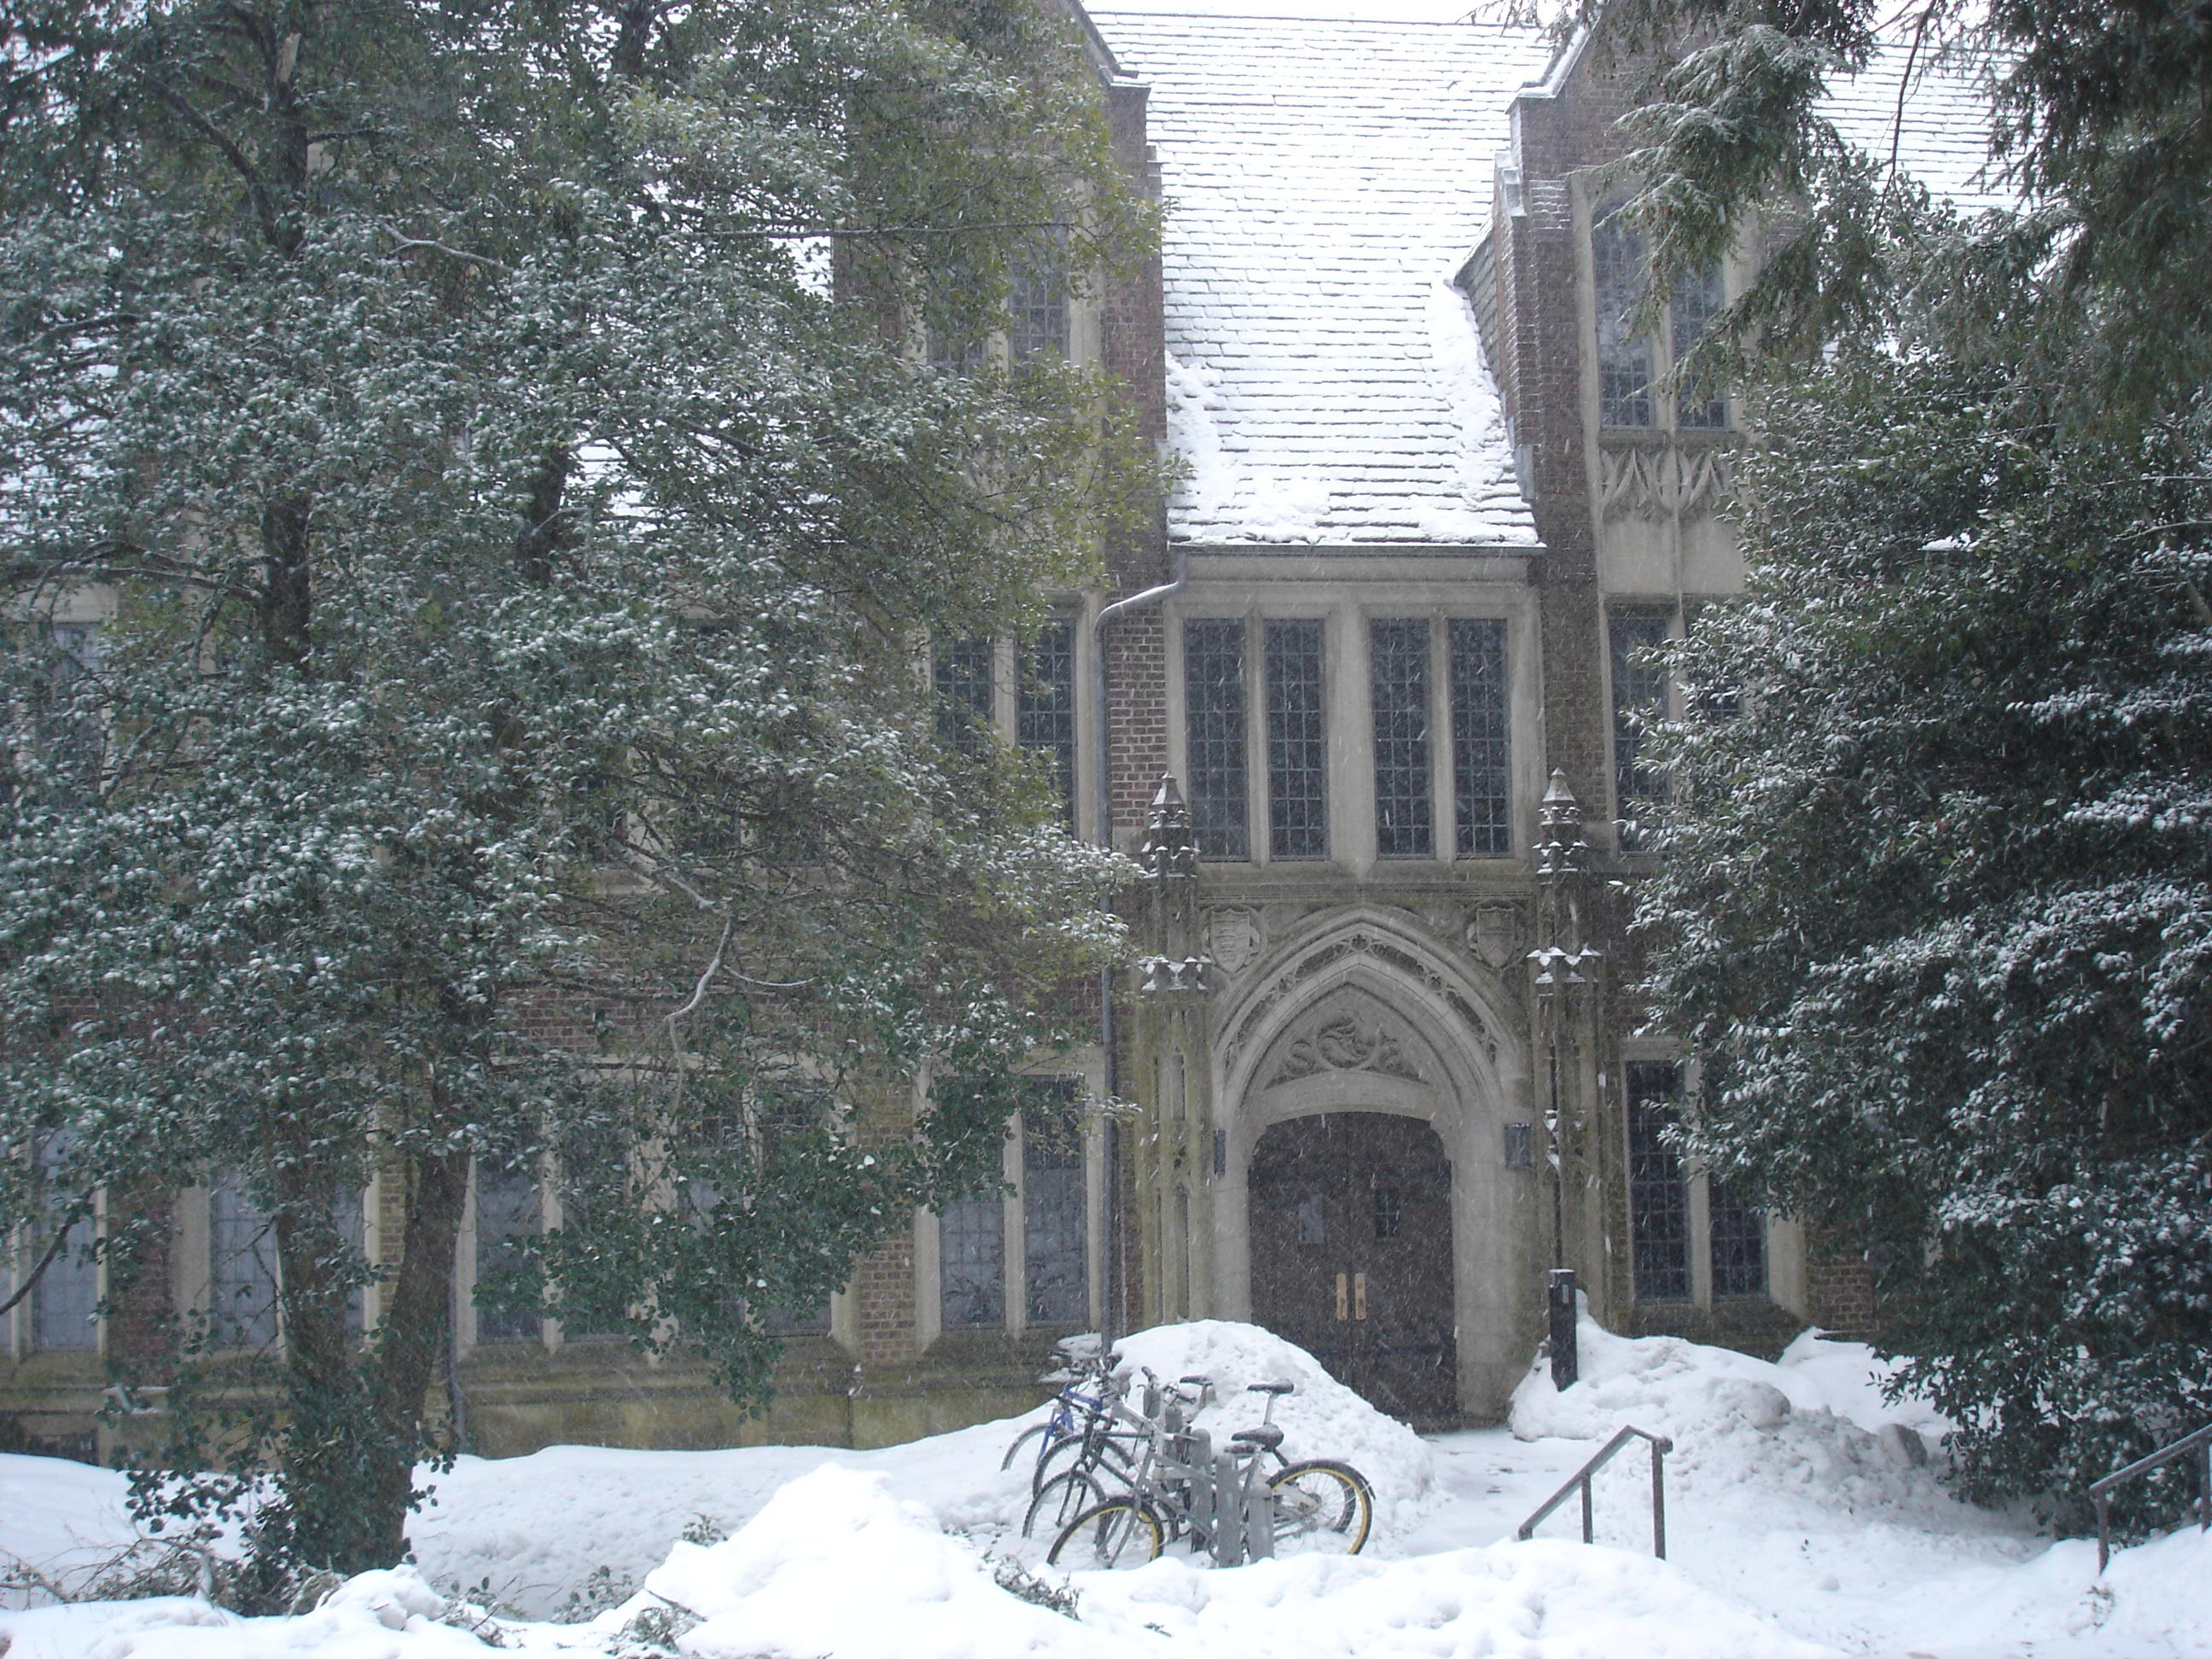 Hall Jones, Université de Princeton